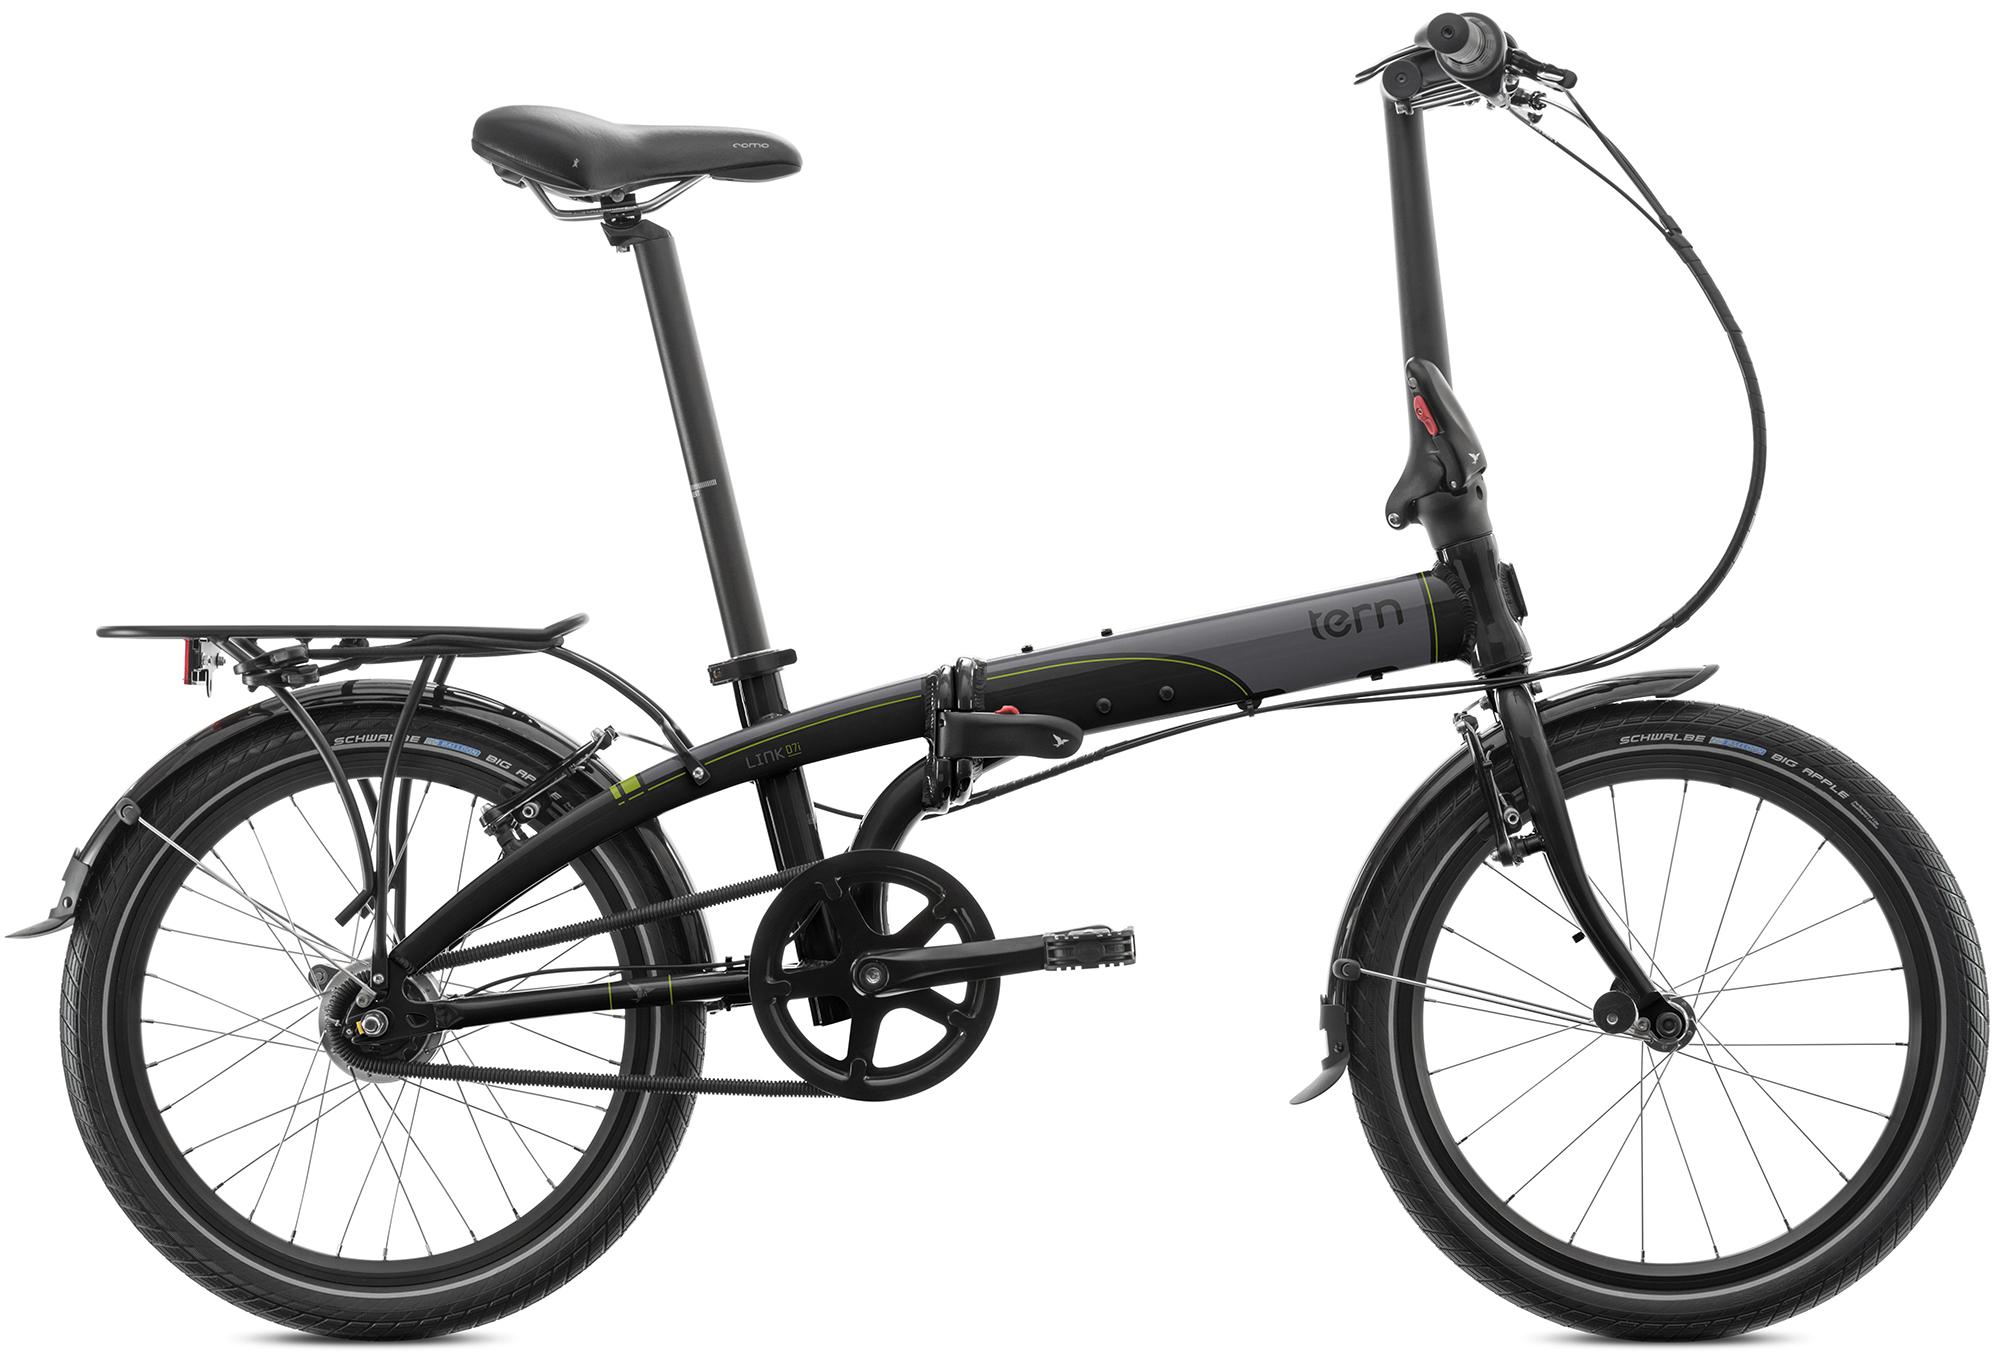 Tern Велосипед складной Tern Link D7i